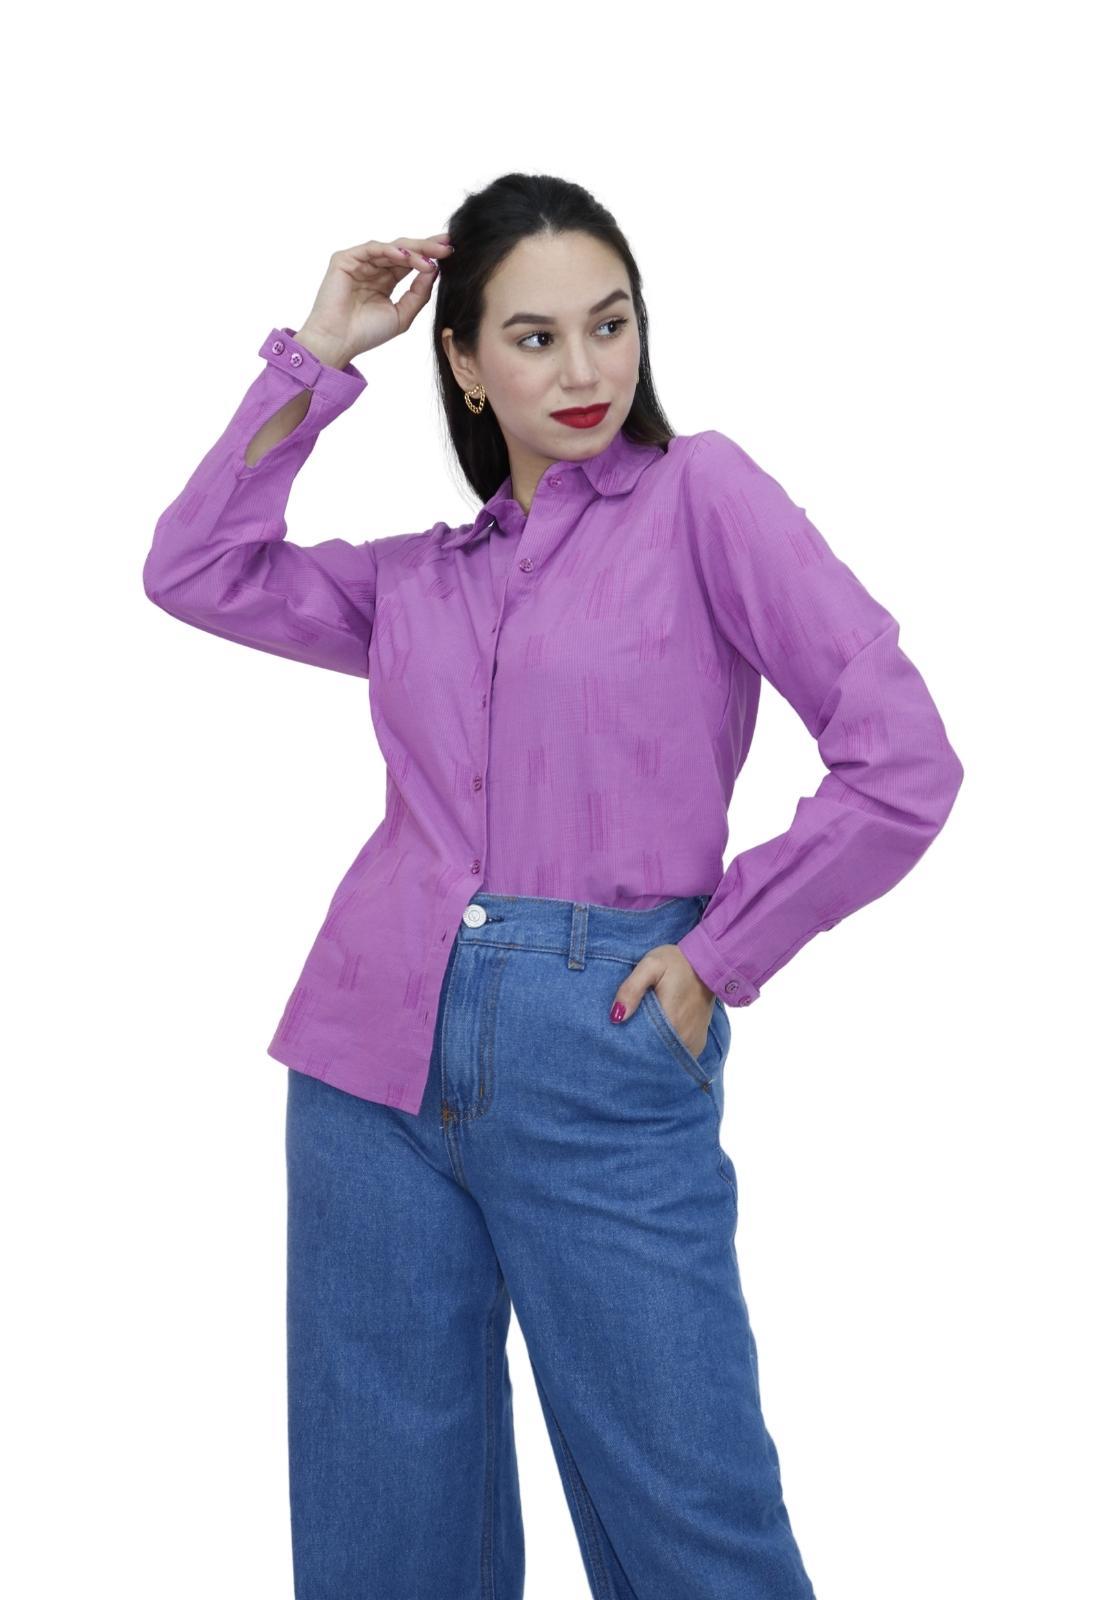 Camisa Feminina Casual Manga Longa Botões